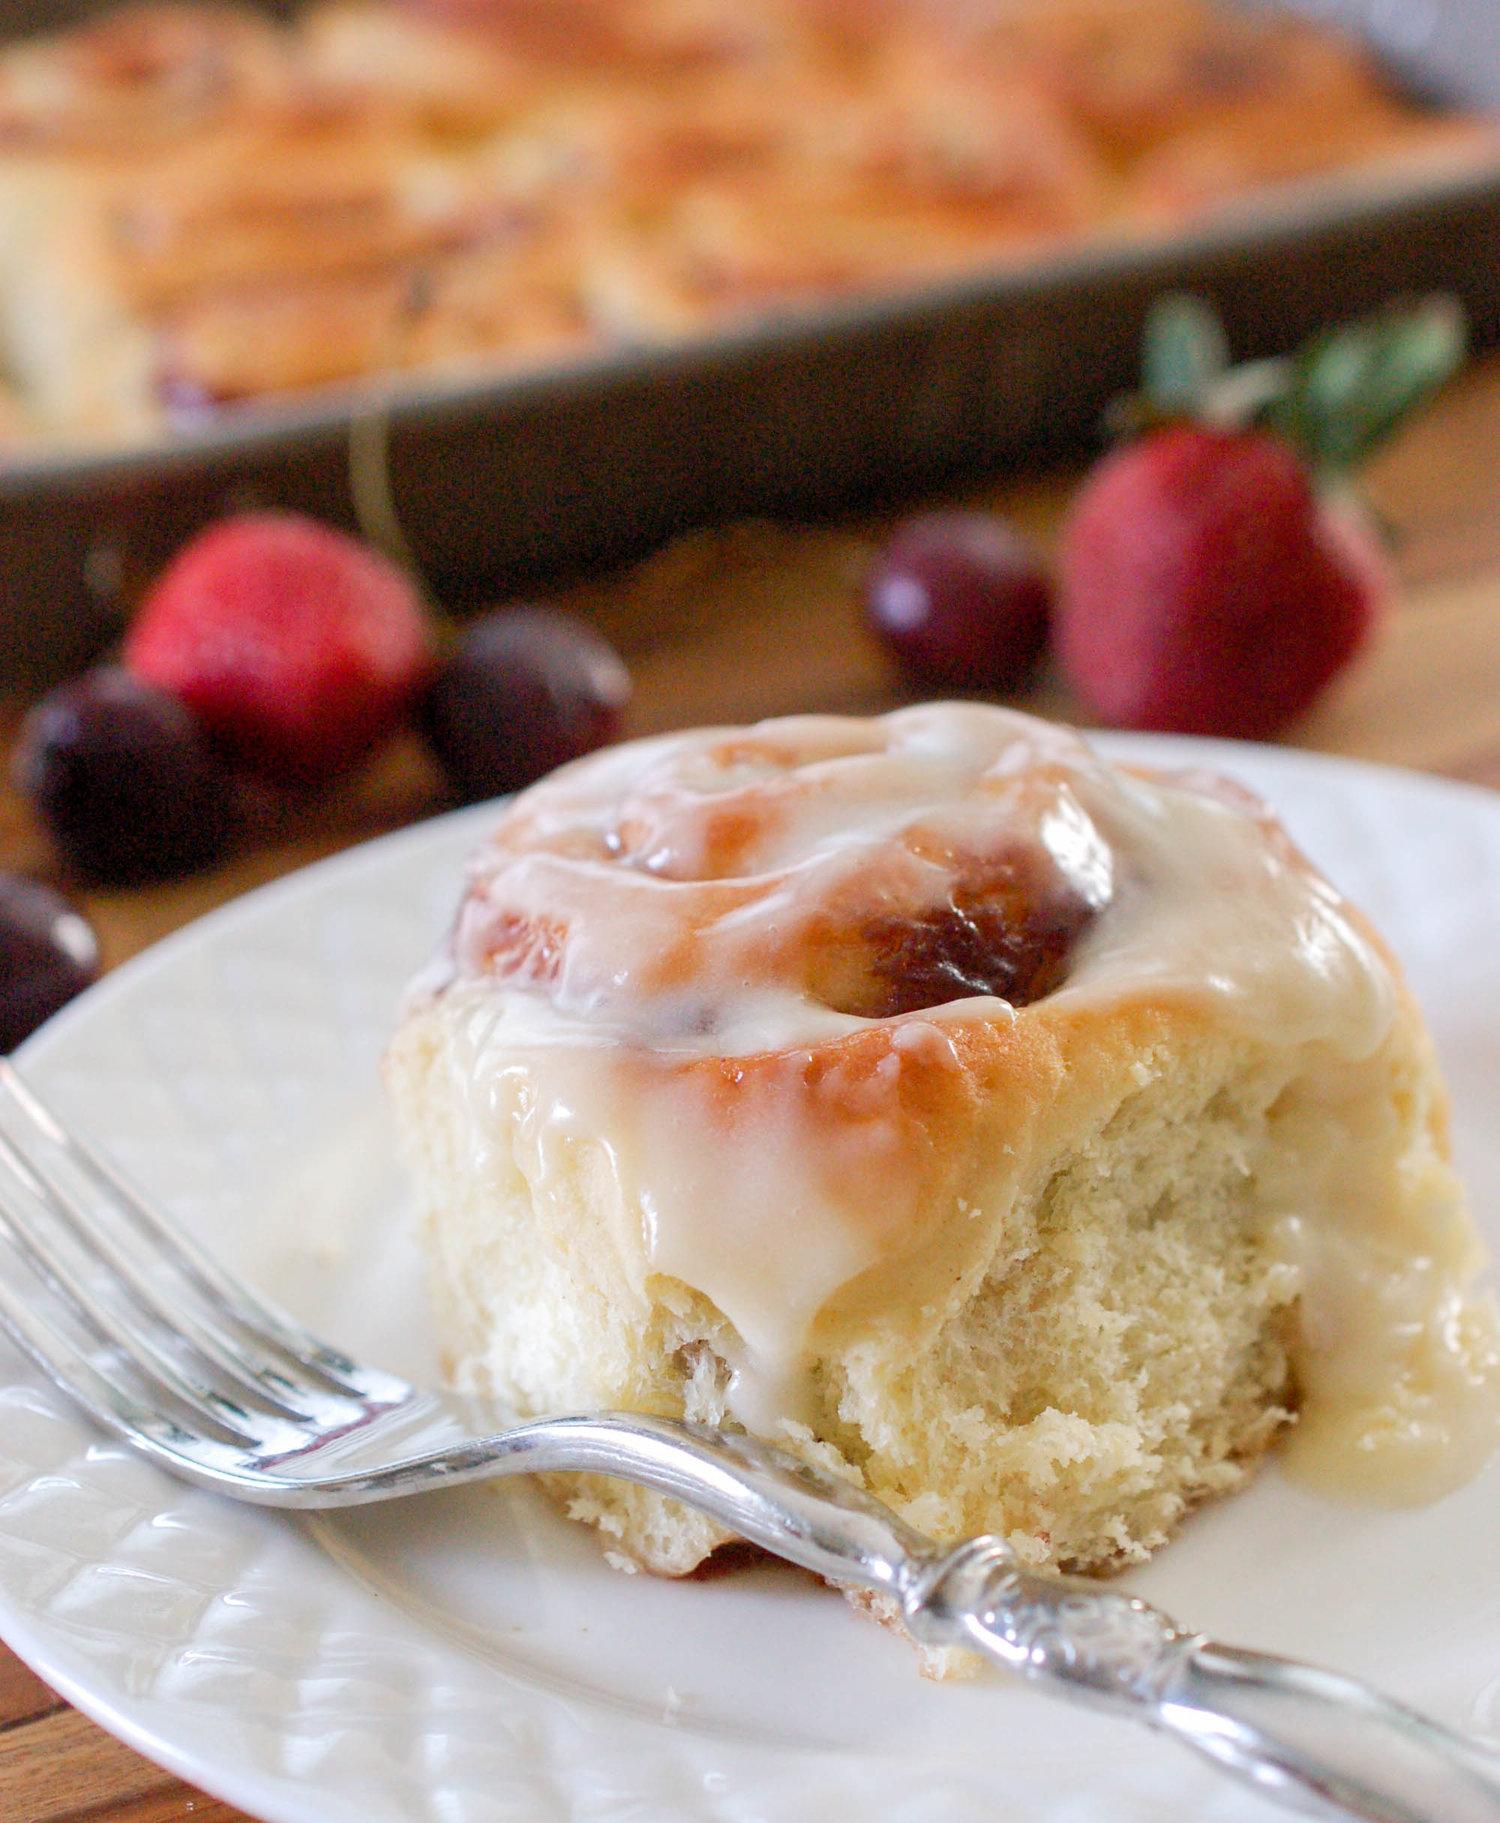 Apple Butter Spread Cherchies